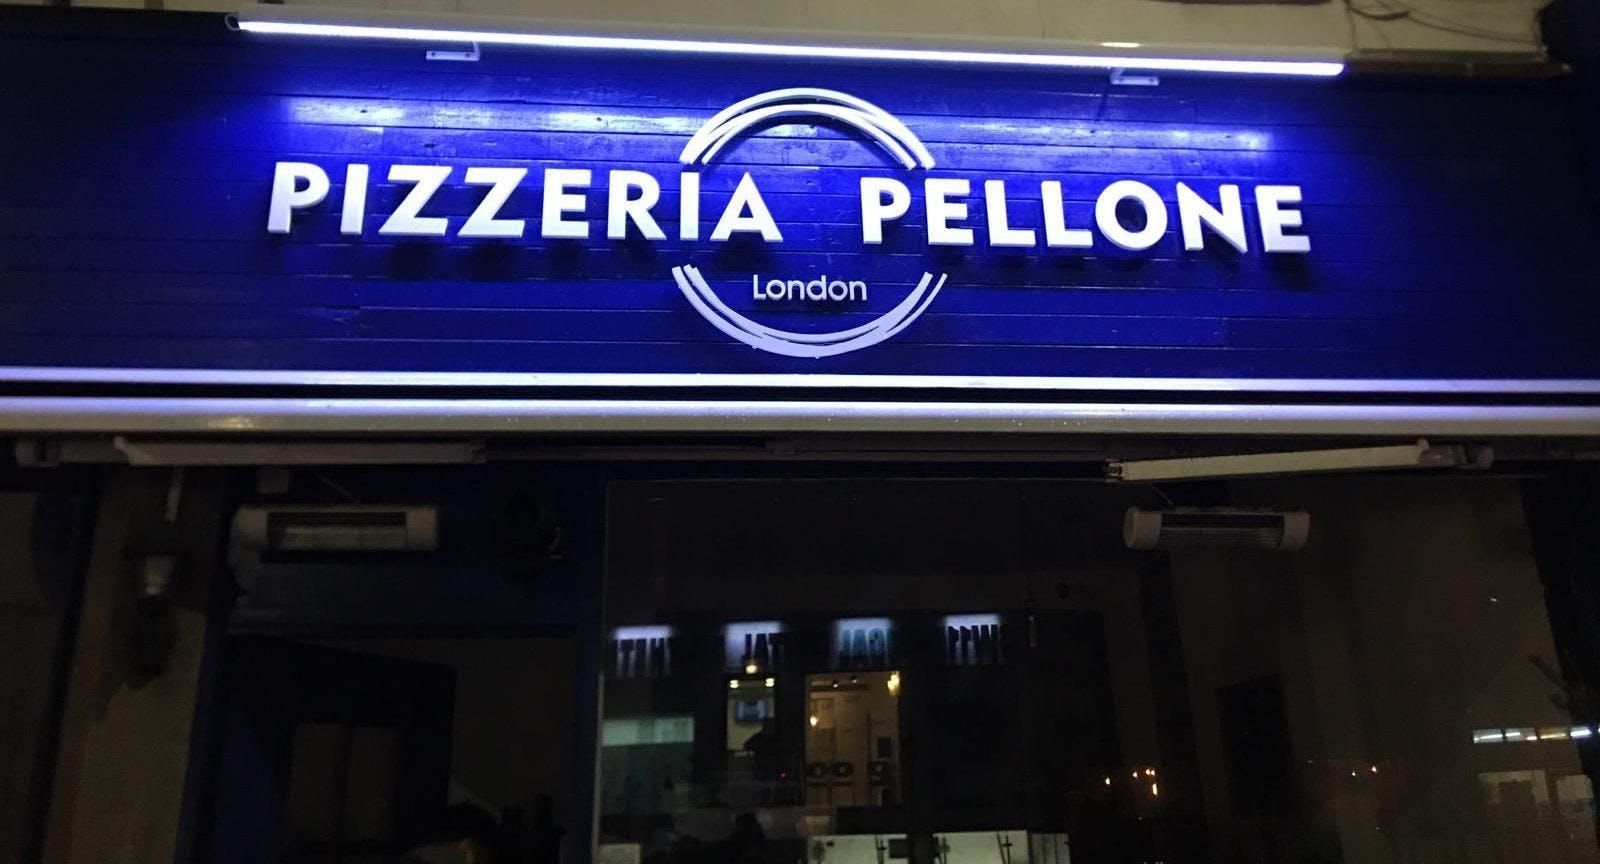 Pizzeria Pellone London